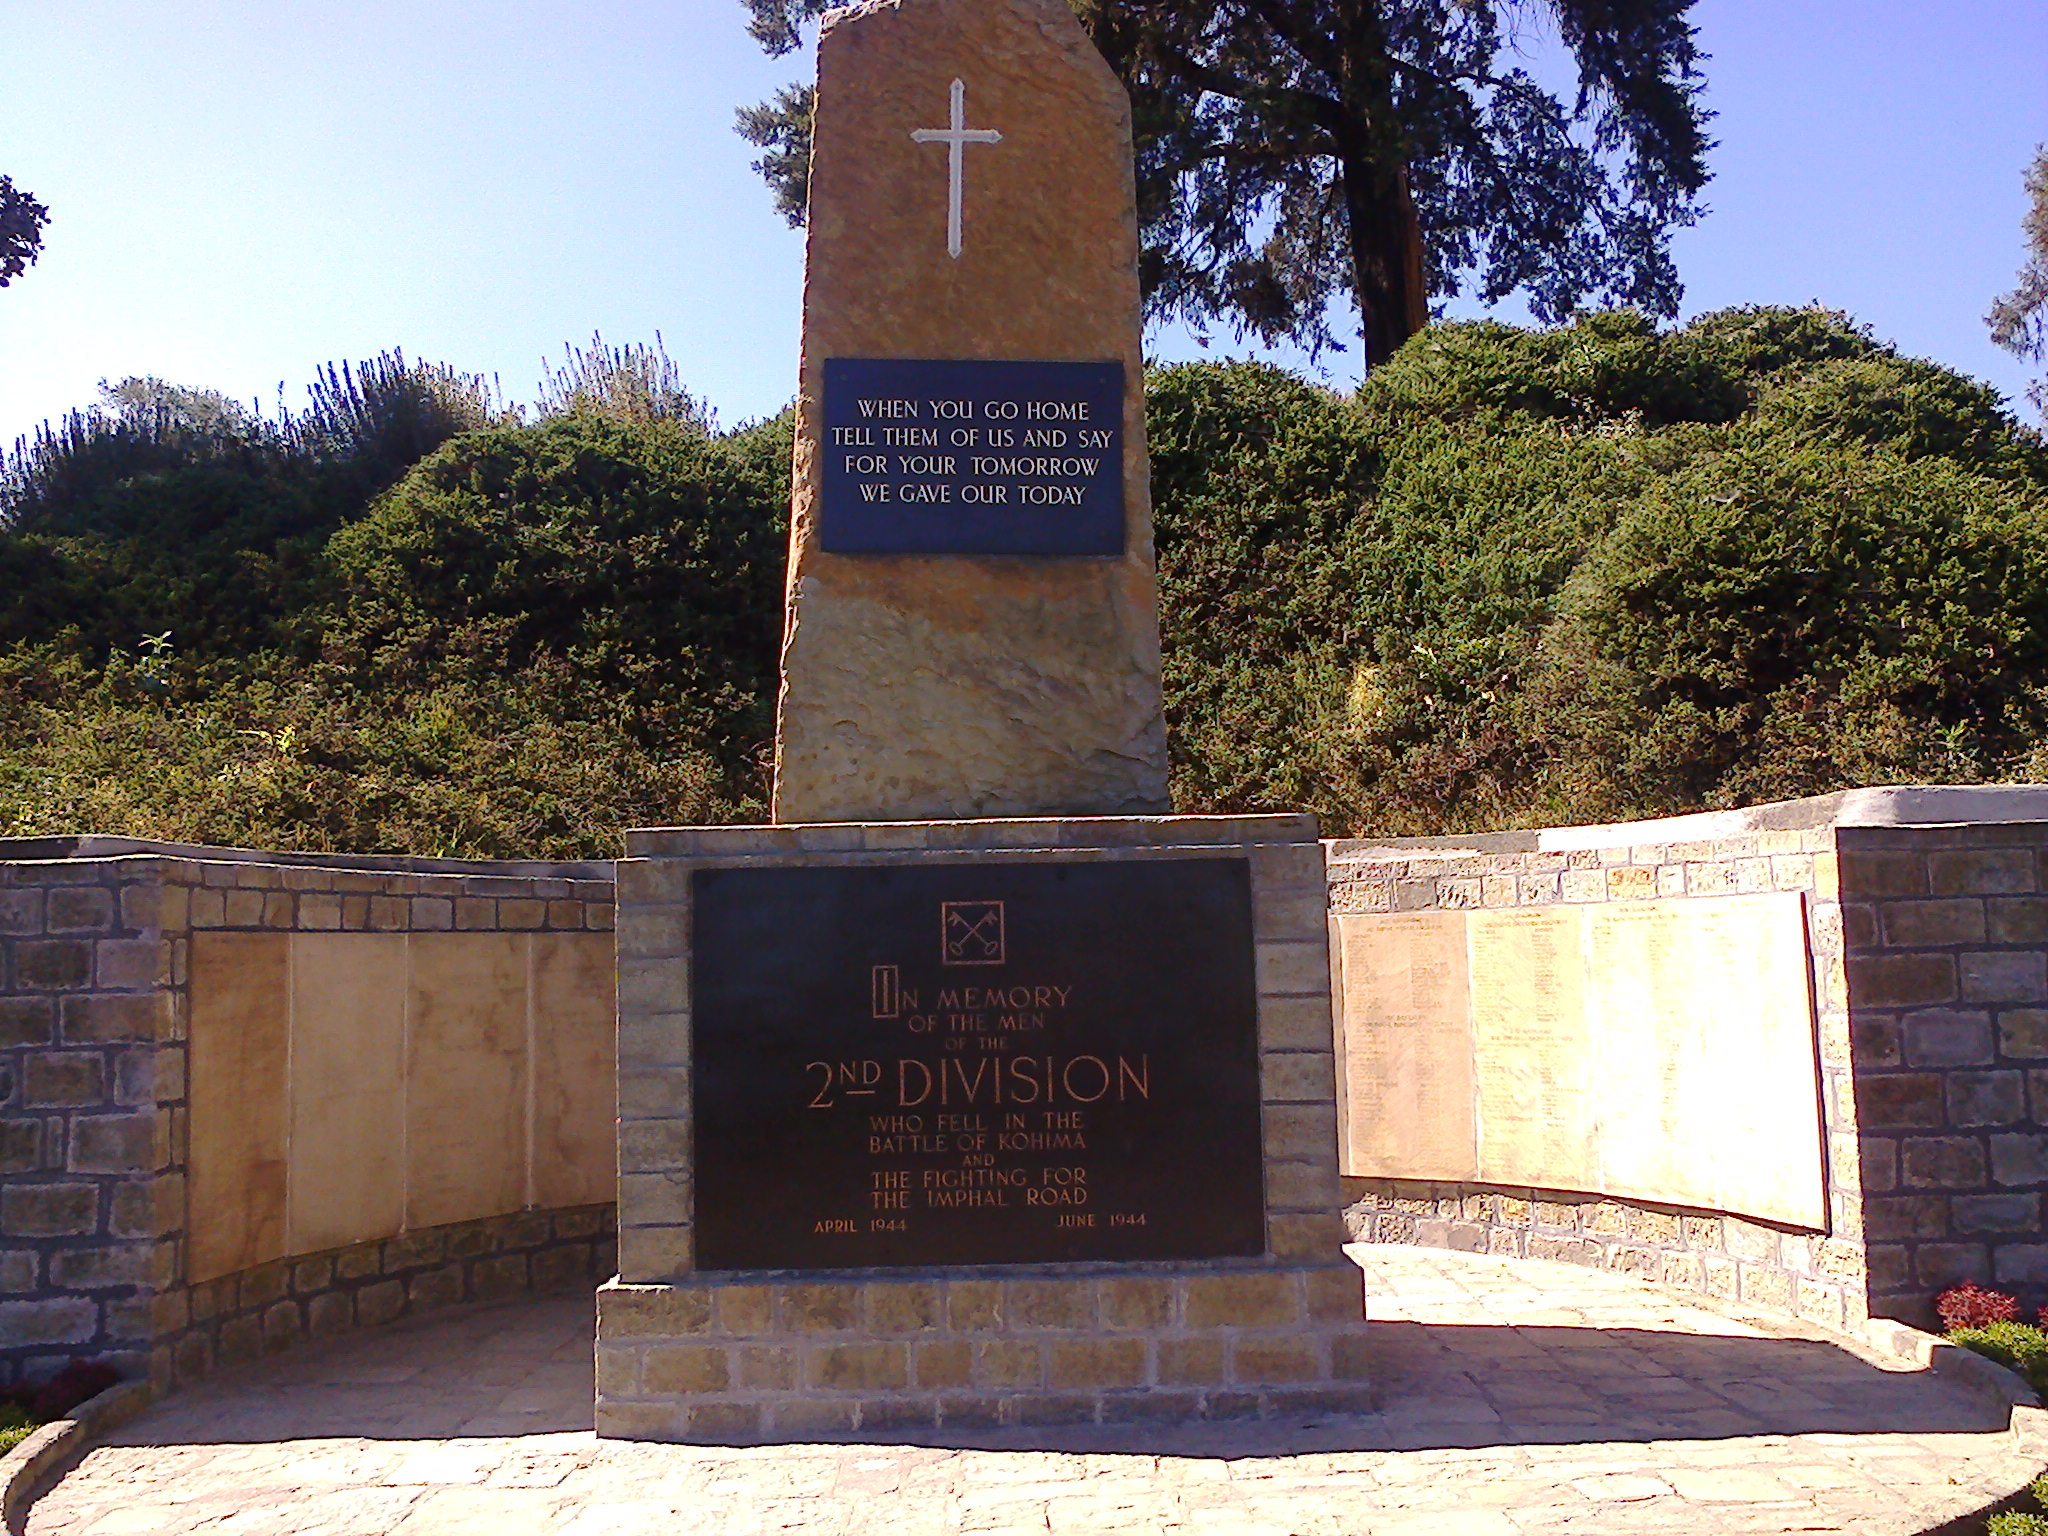 File:Kohima War Cemetery, Kohima, Nagaland (89).jpeg - Wikimedia Commons